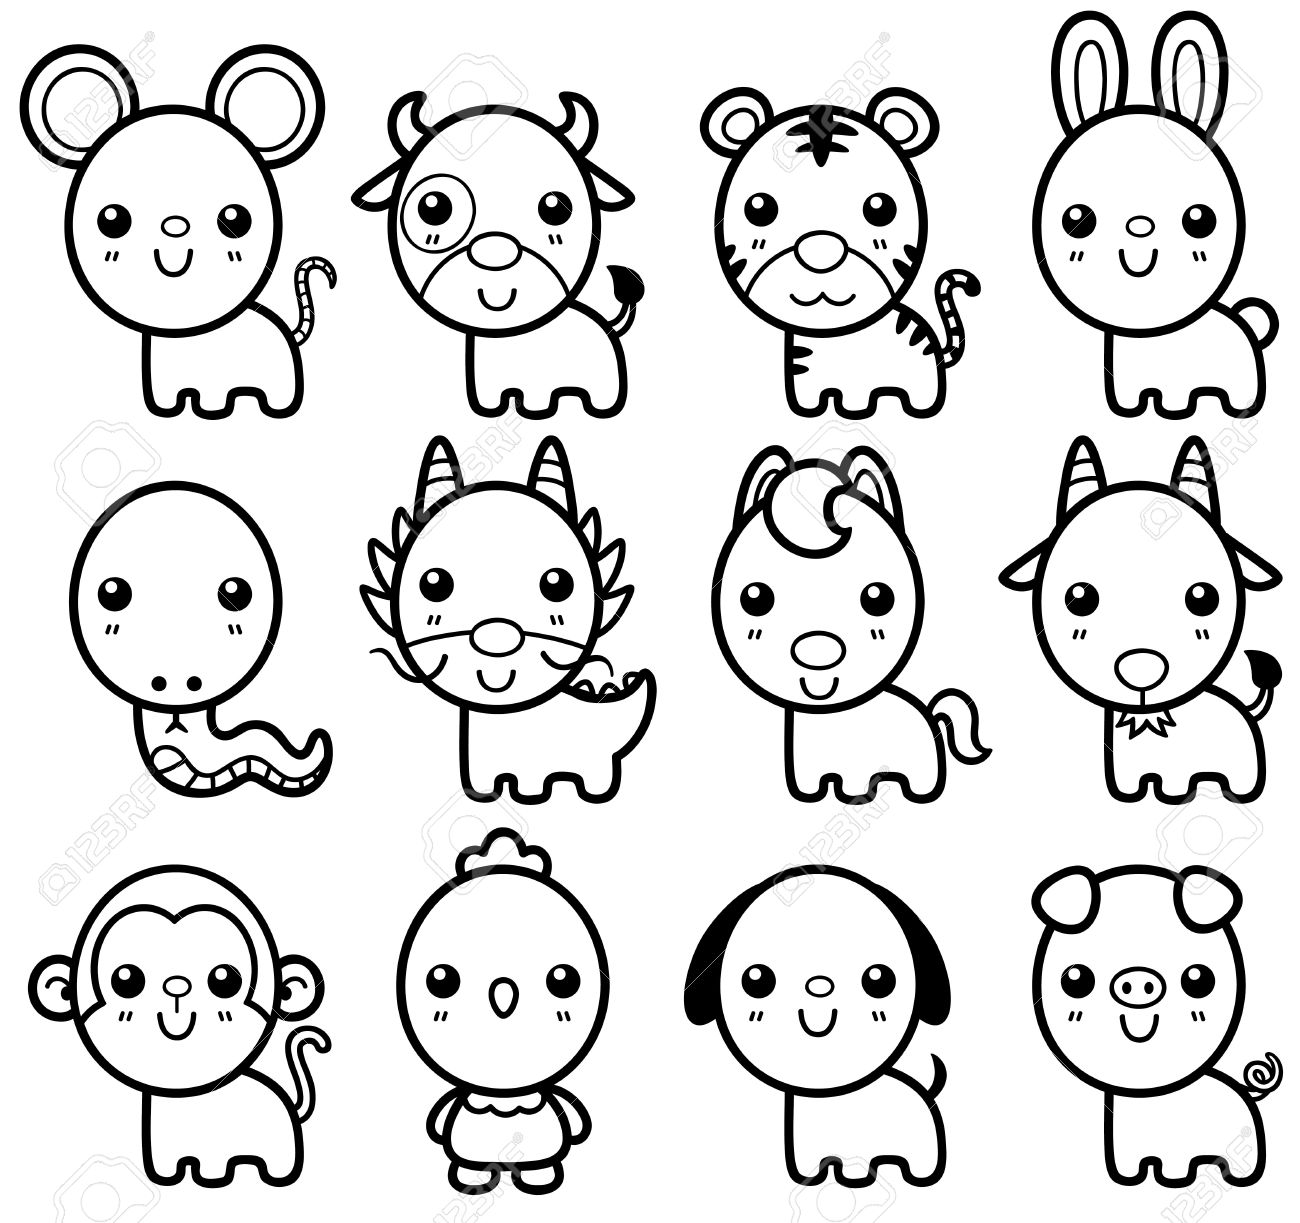 Dibujos Animados Animales Para Dibujar Y Pintar